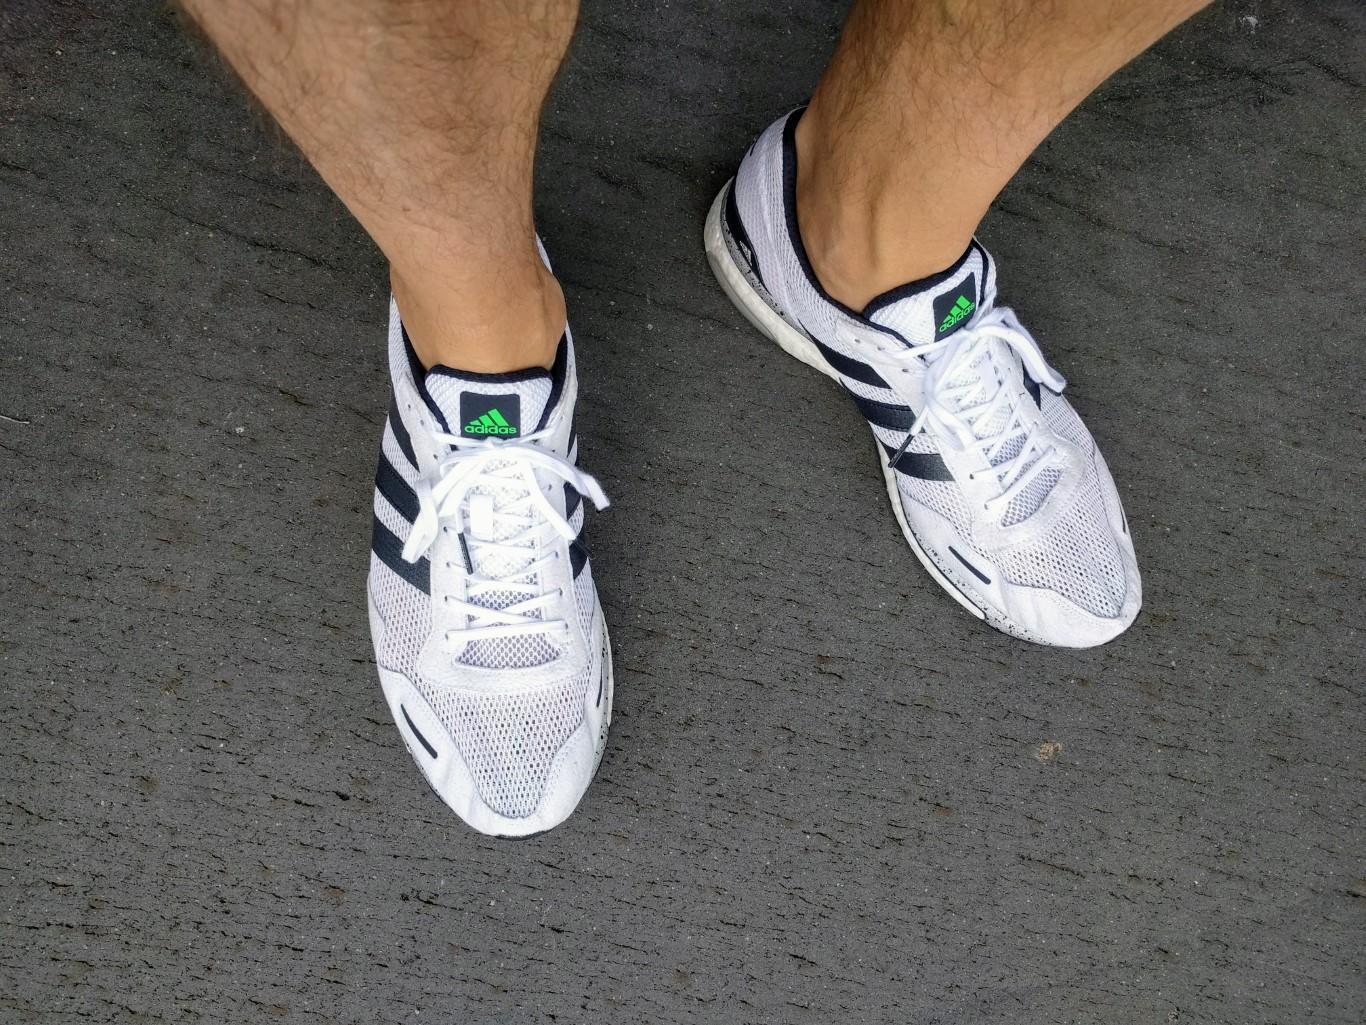 adidas adizero adios 3 | HarleRunner - ein Laufblog aus Coesfeld